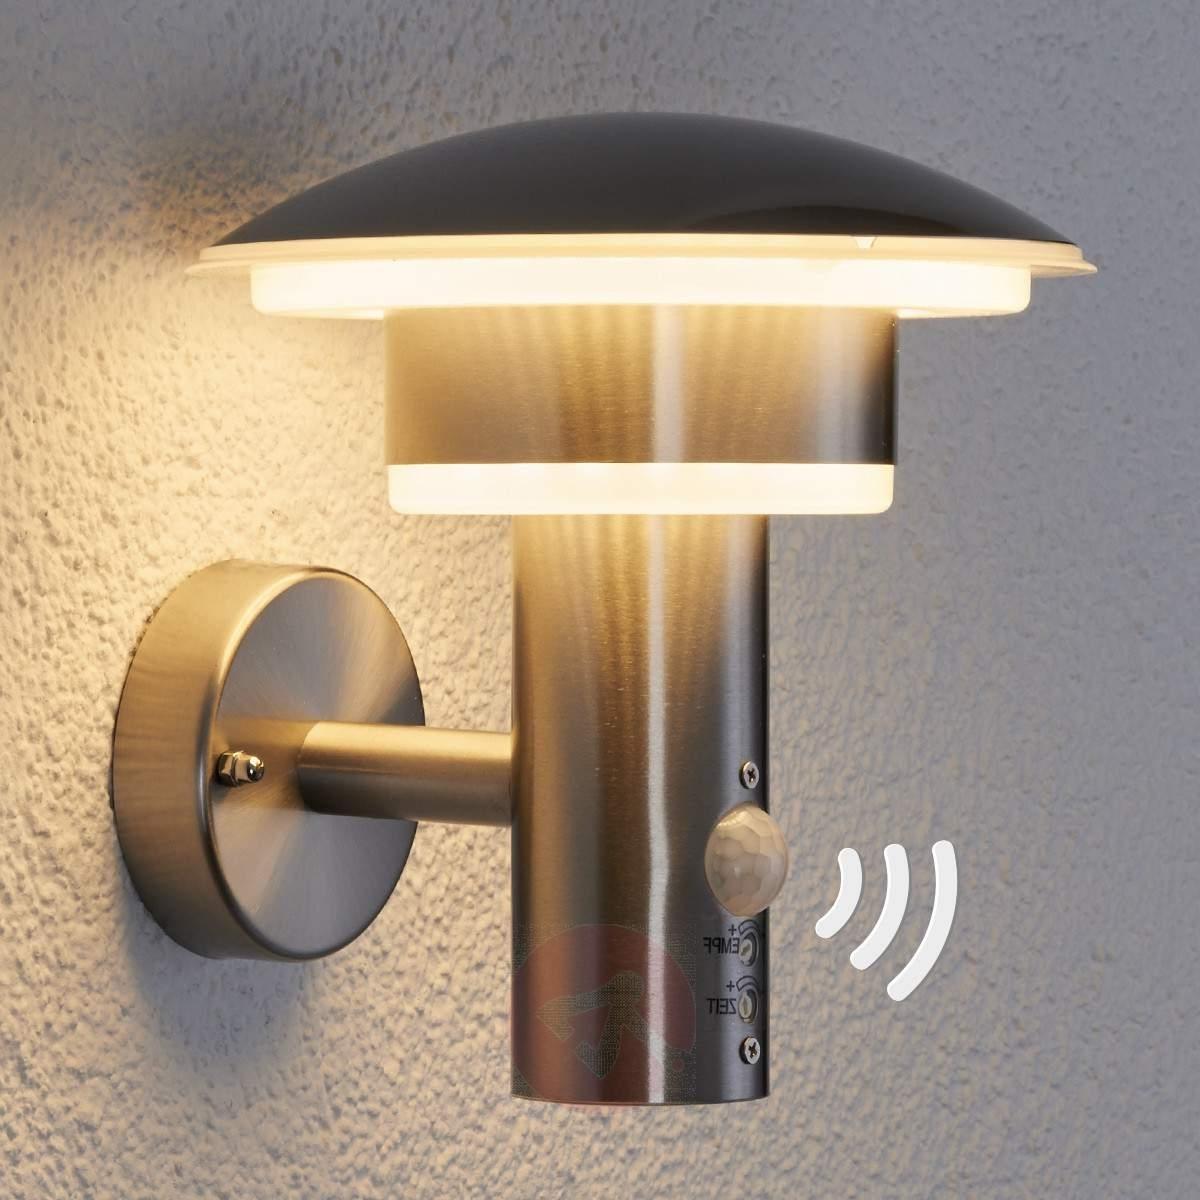 Sorrentos Bistro Home With Regard To Vinyl Outdoor Wall Lighting (View 12 of 20)